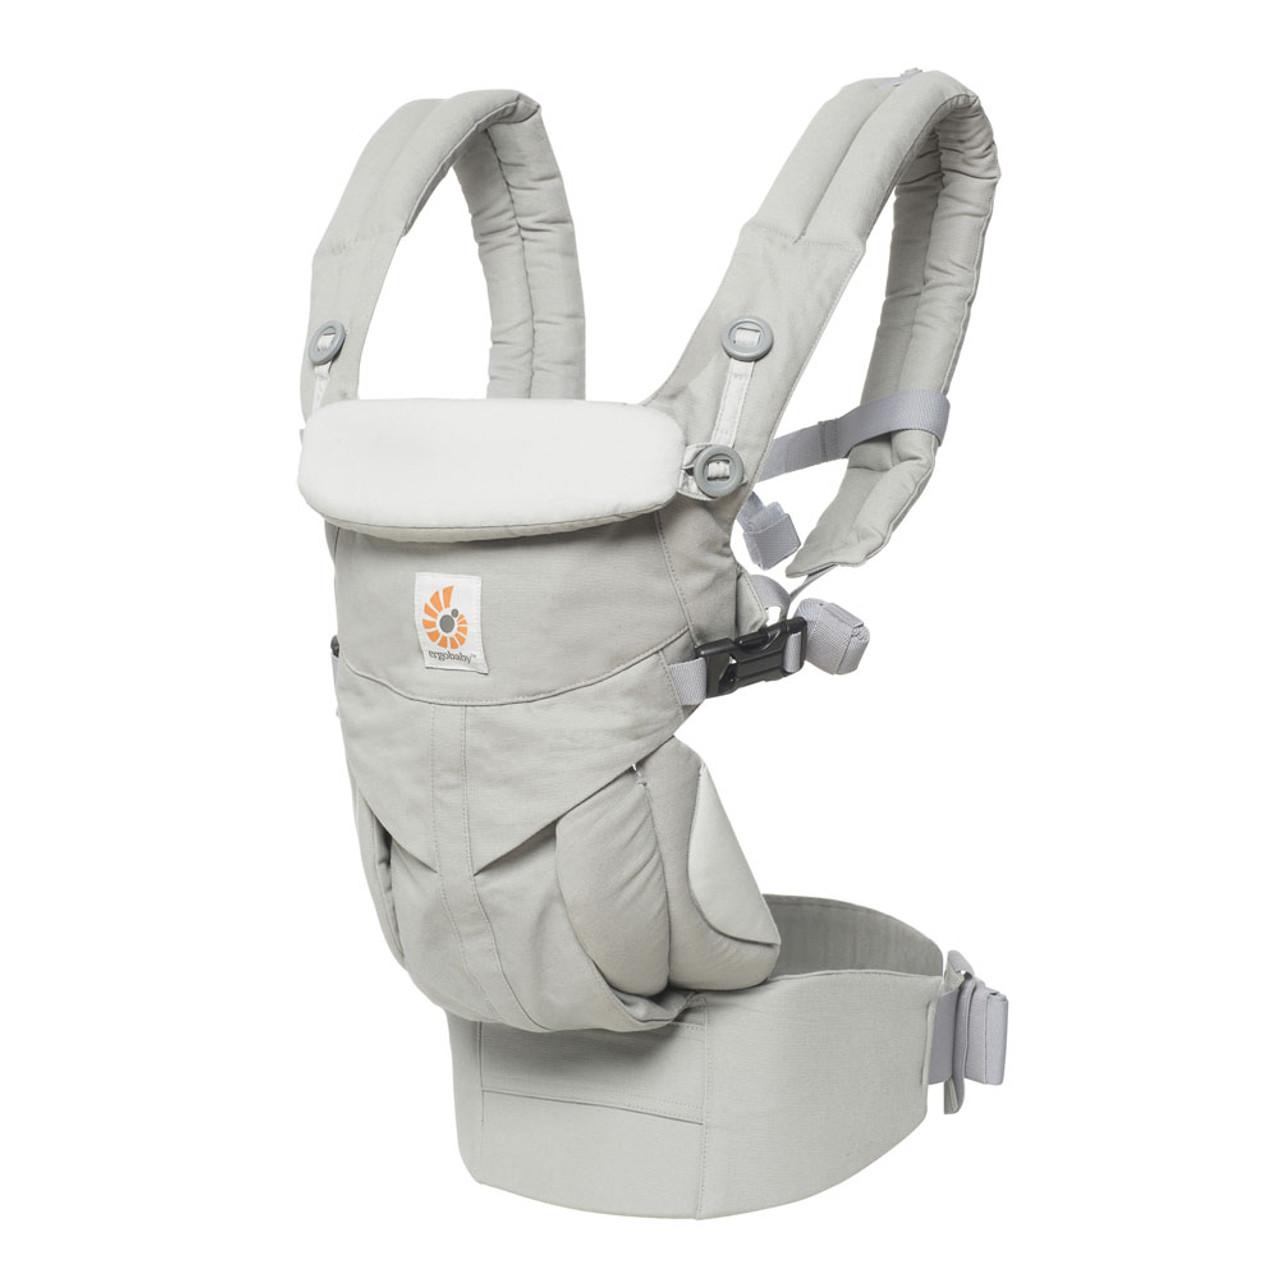 932d094e82d Ergobaby Omni 360 Baby Carrier - Pearl Grey - Dear-Born Baby